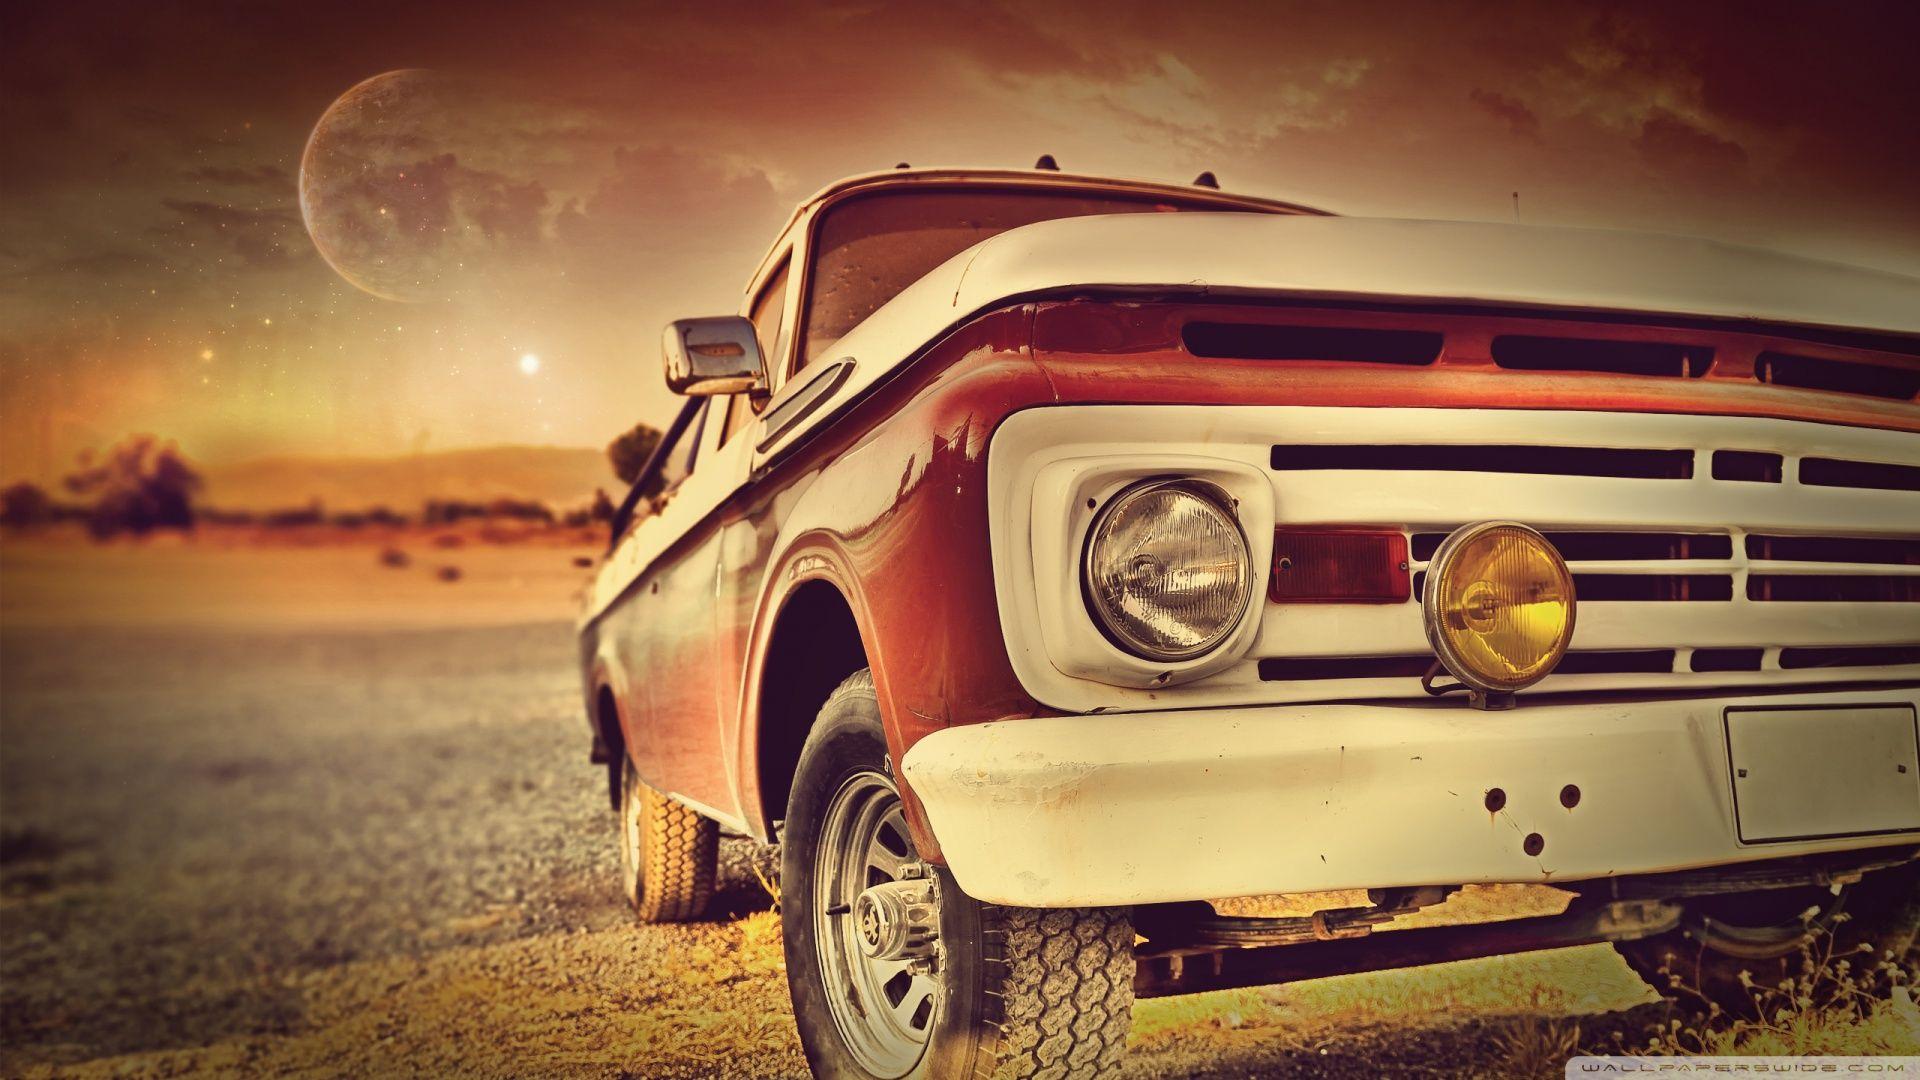 Car, Classic, Next Lake, Beauty, Photo Vintage, Hd Wallpaper